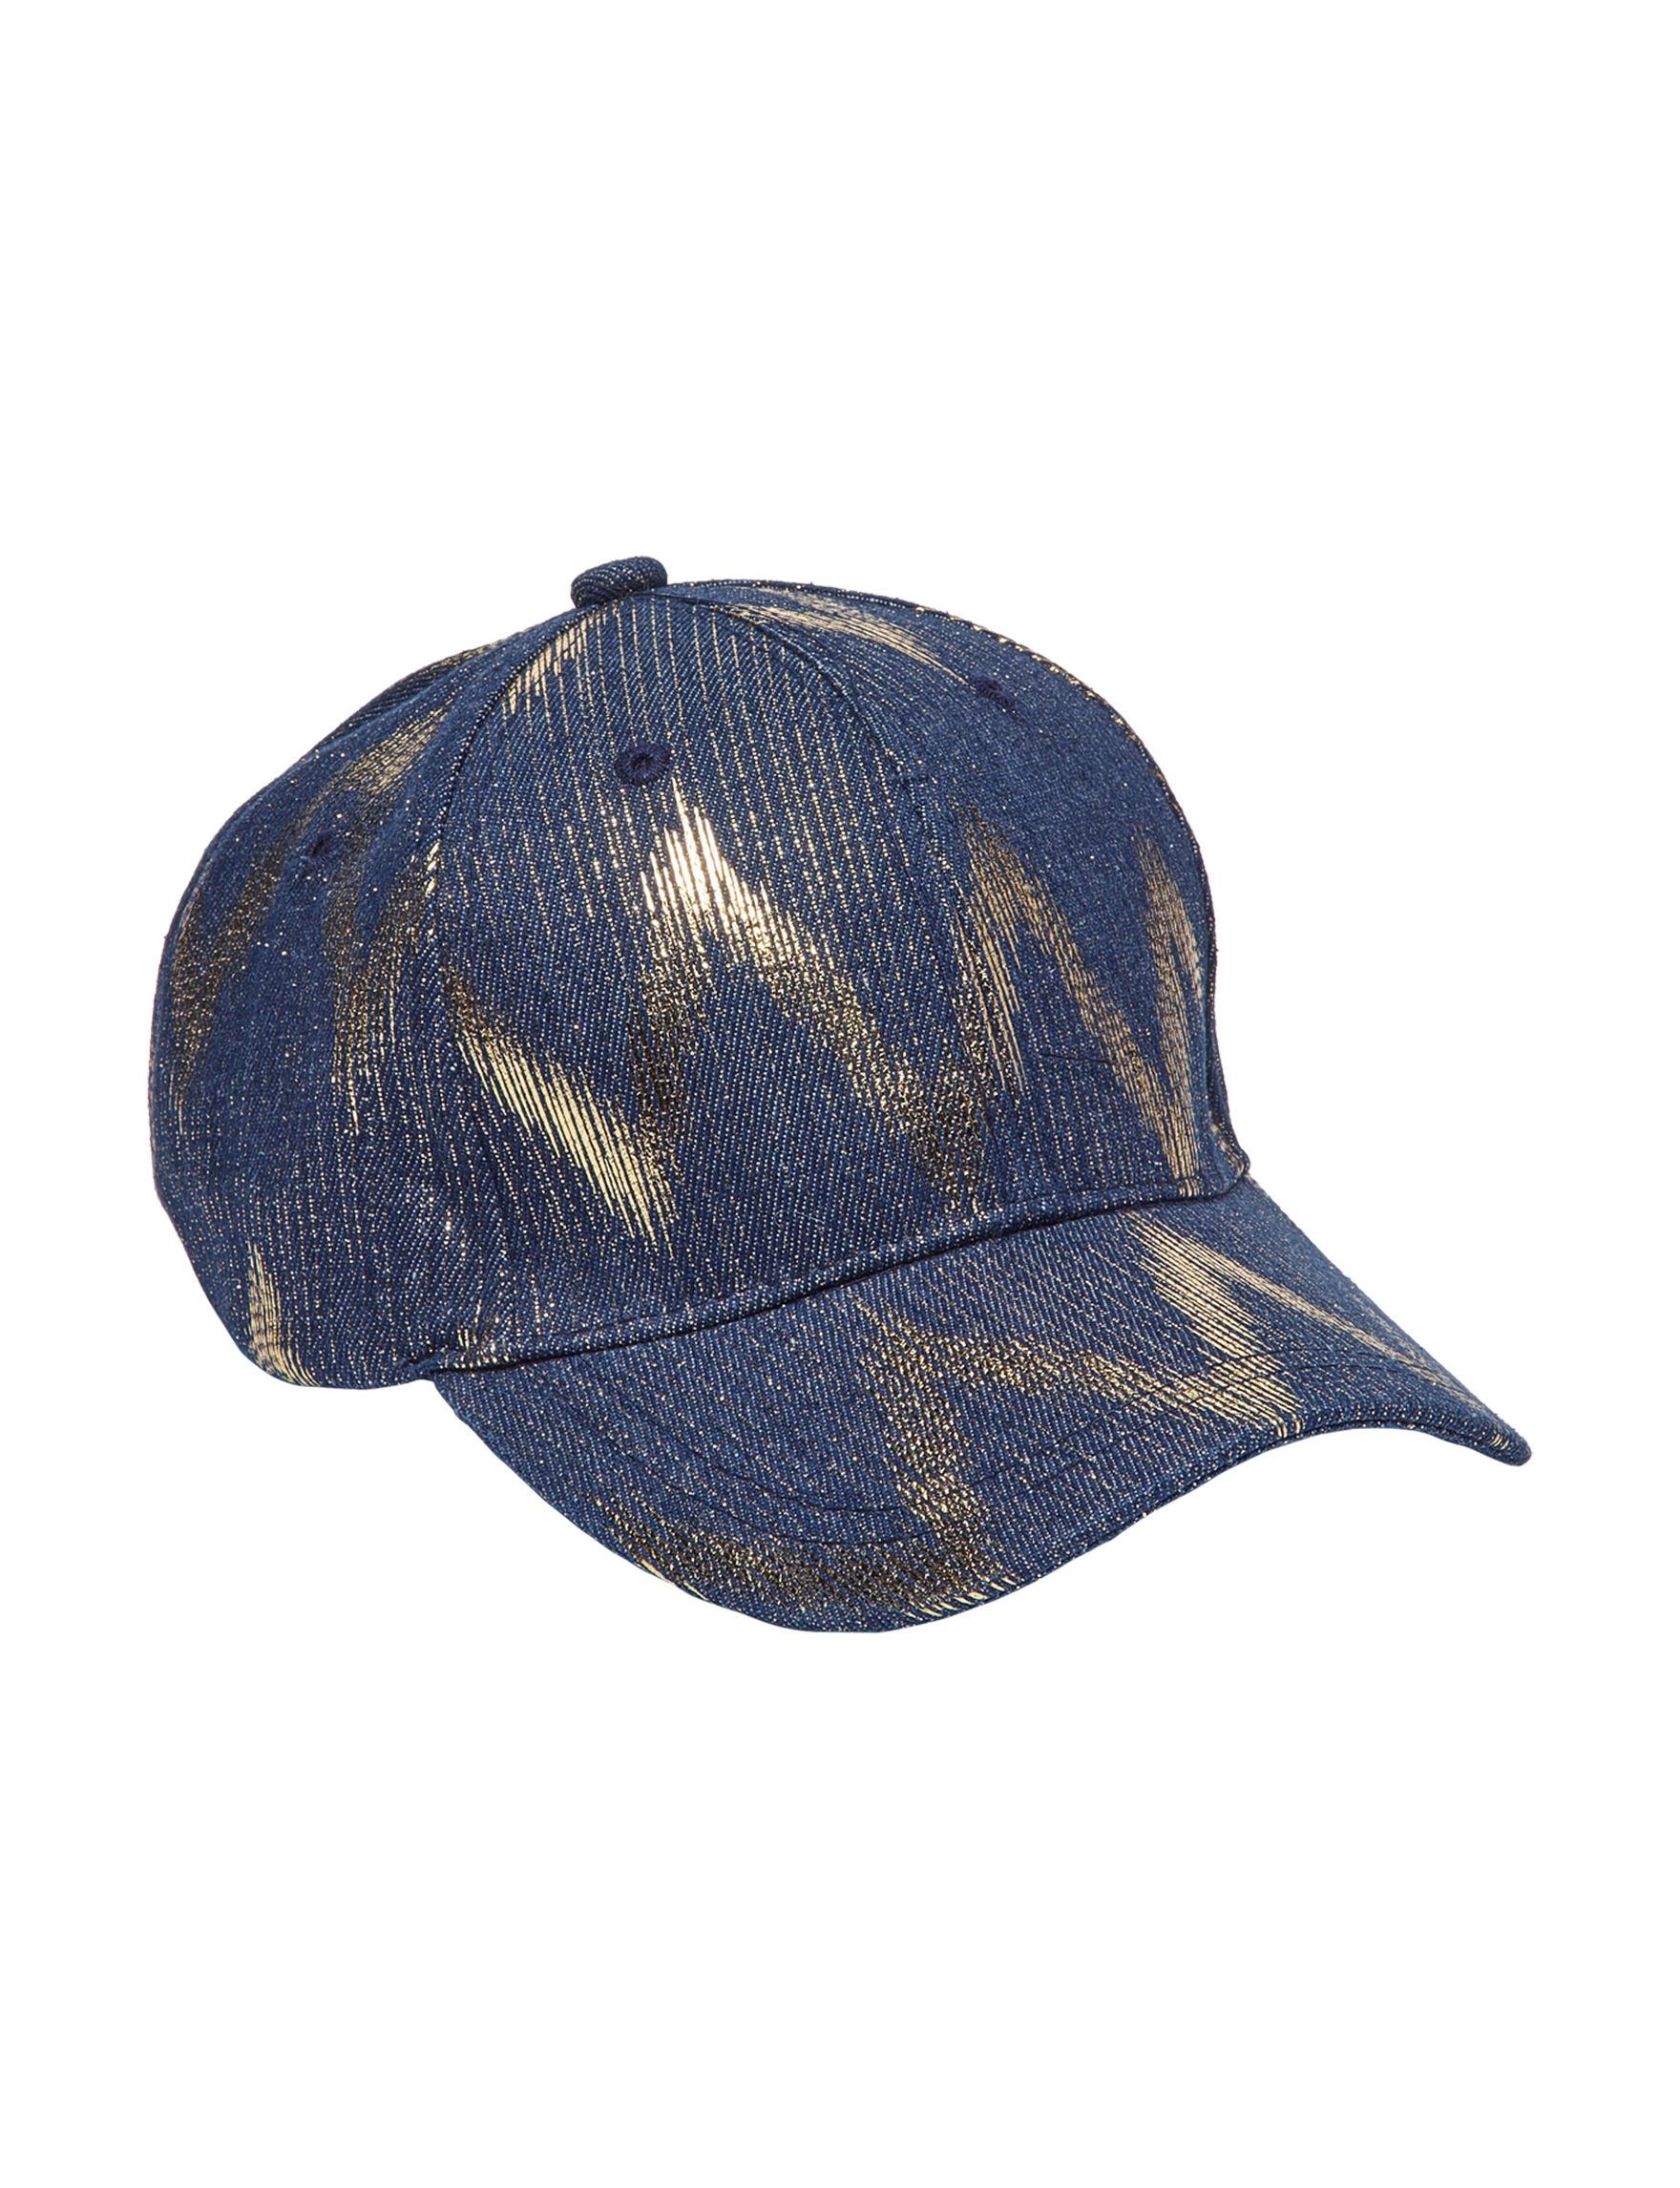 Lake Shore Drive Blue Hats & Headwear